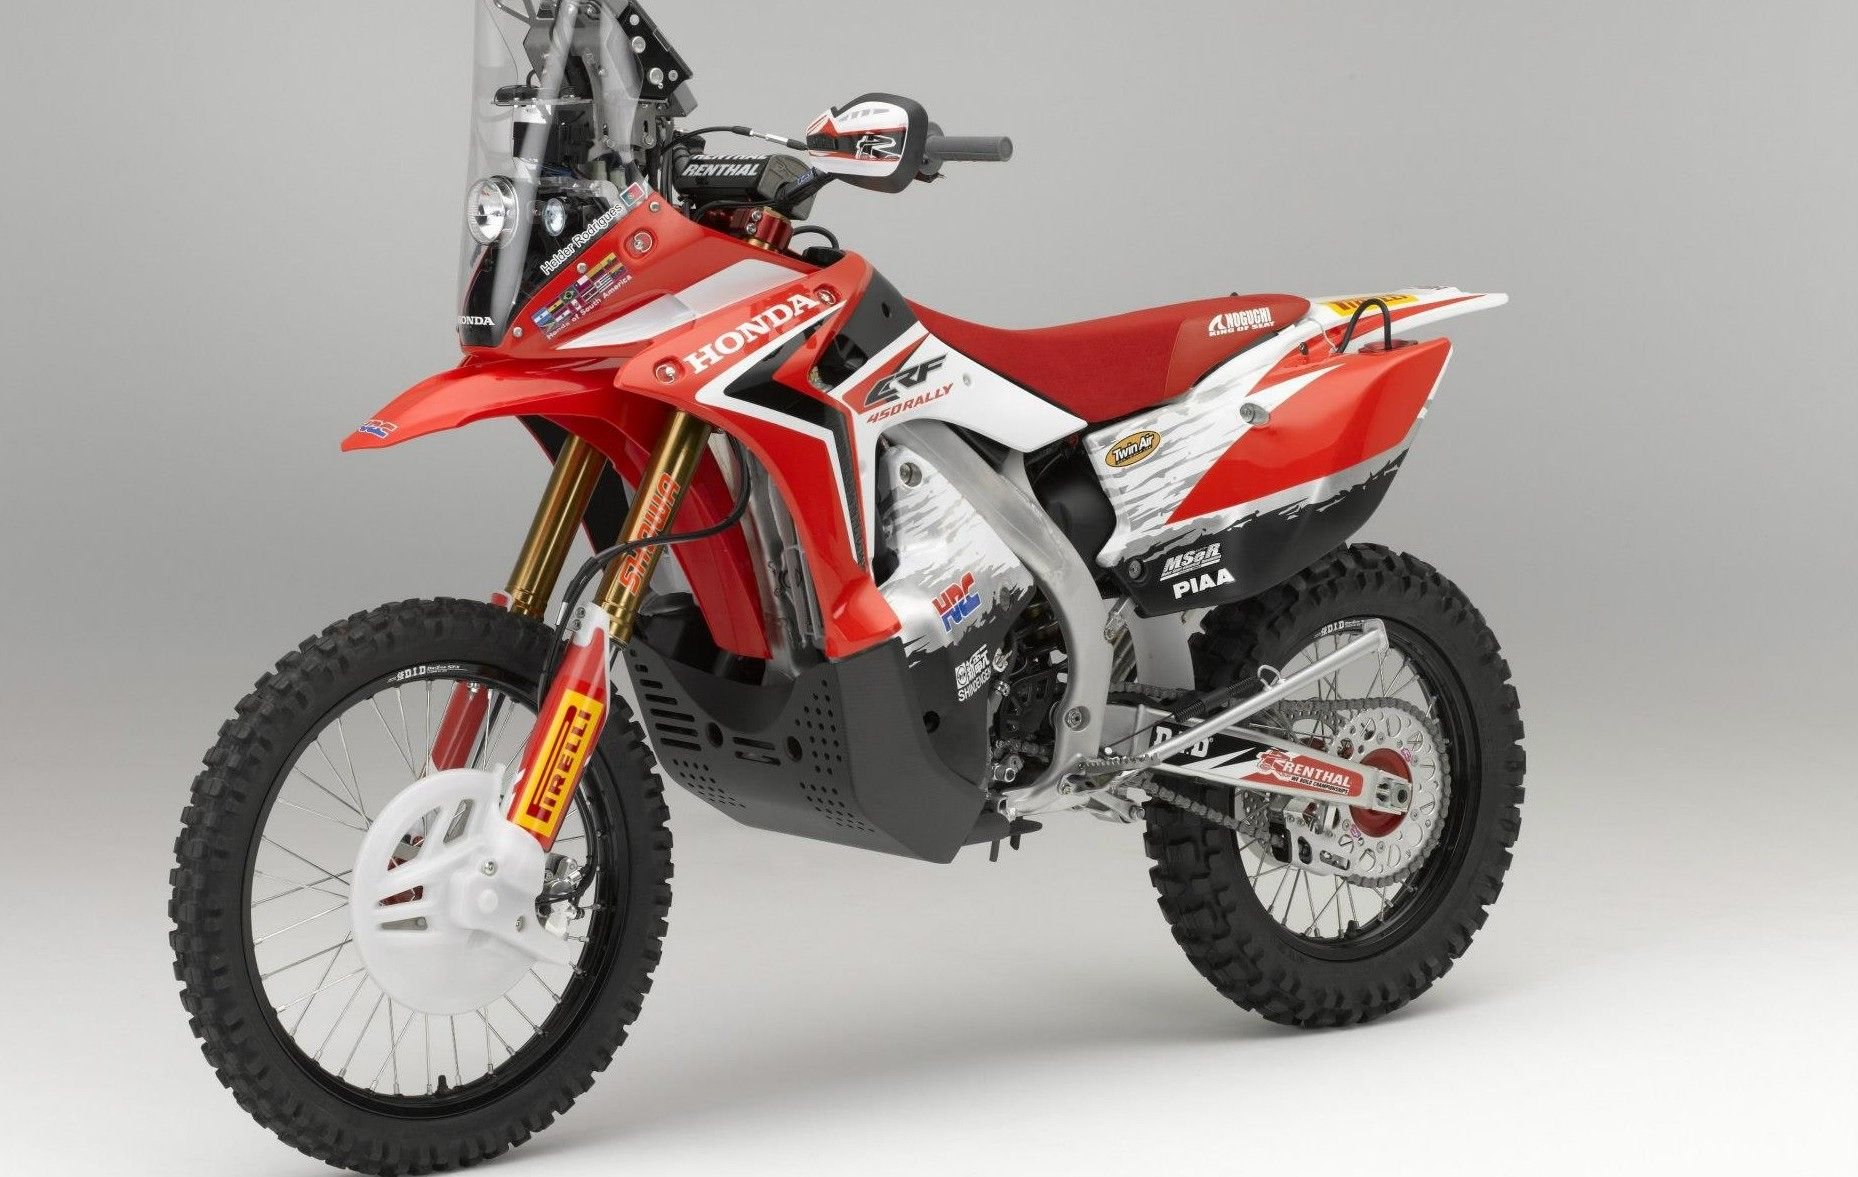 yamaha dual sport 450 Google Search Honda powersports